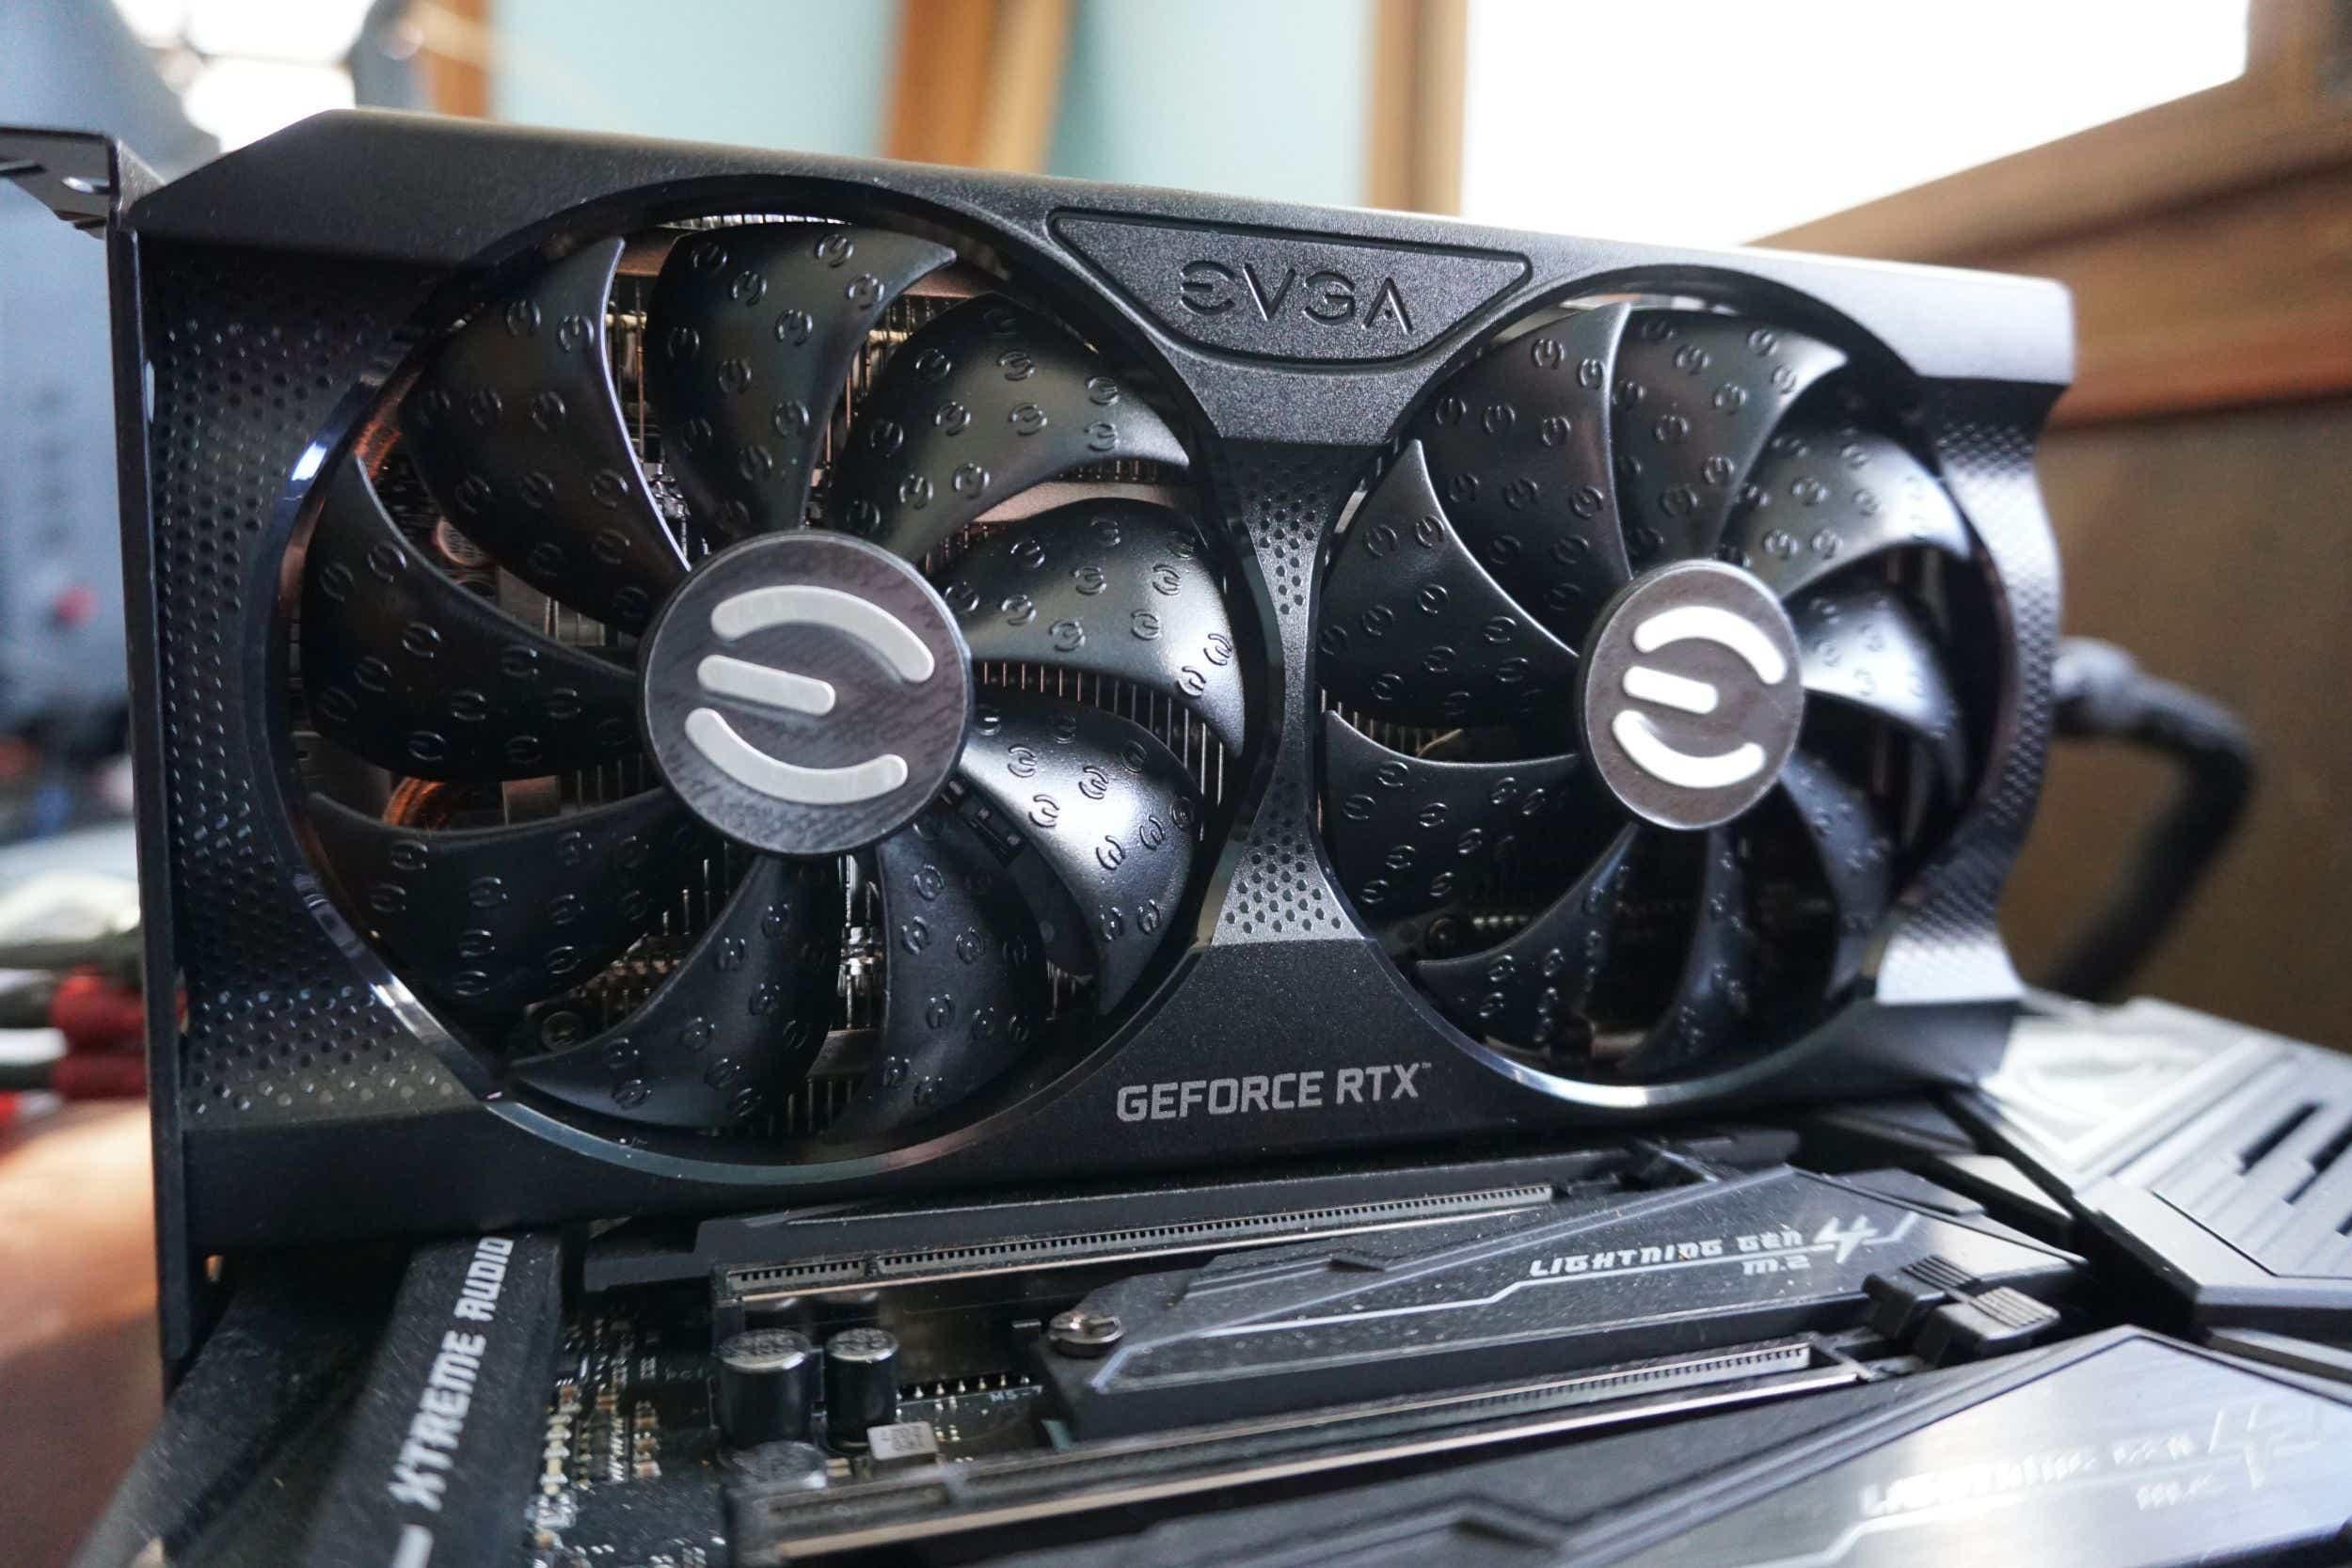 GeForce RTX 3060 XC Black Gaming